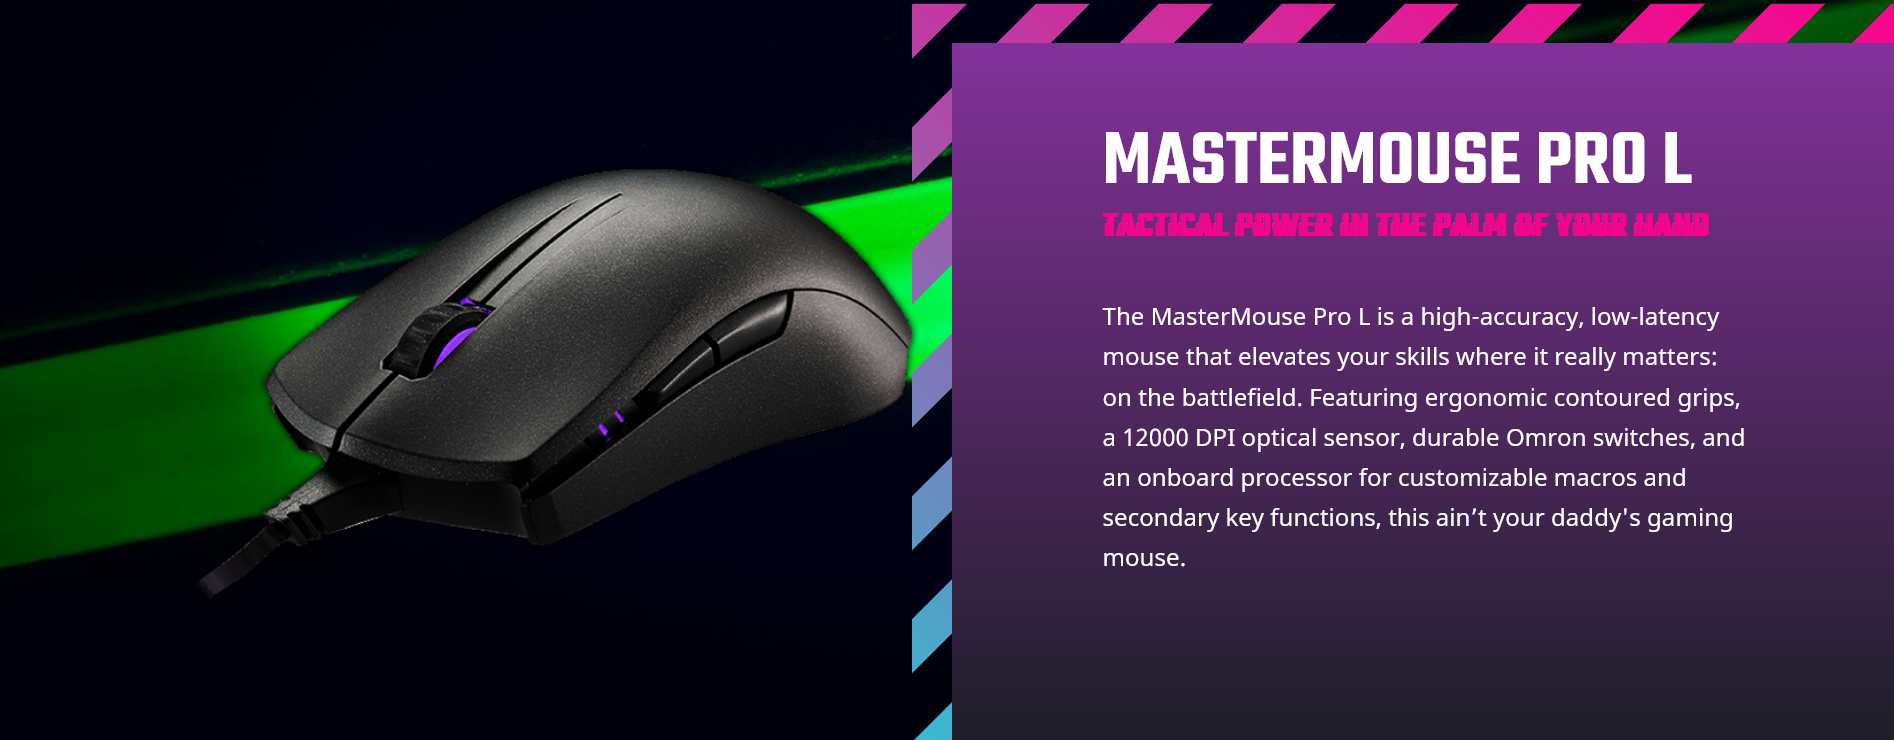 MasterMouse Pro L SGM-4006-KFOA1-Overview